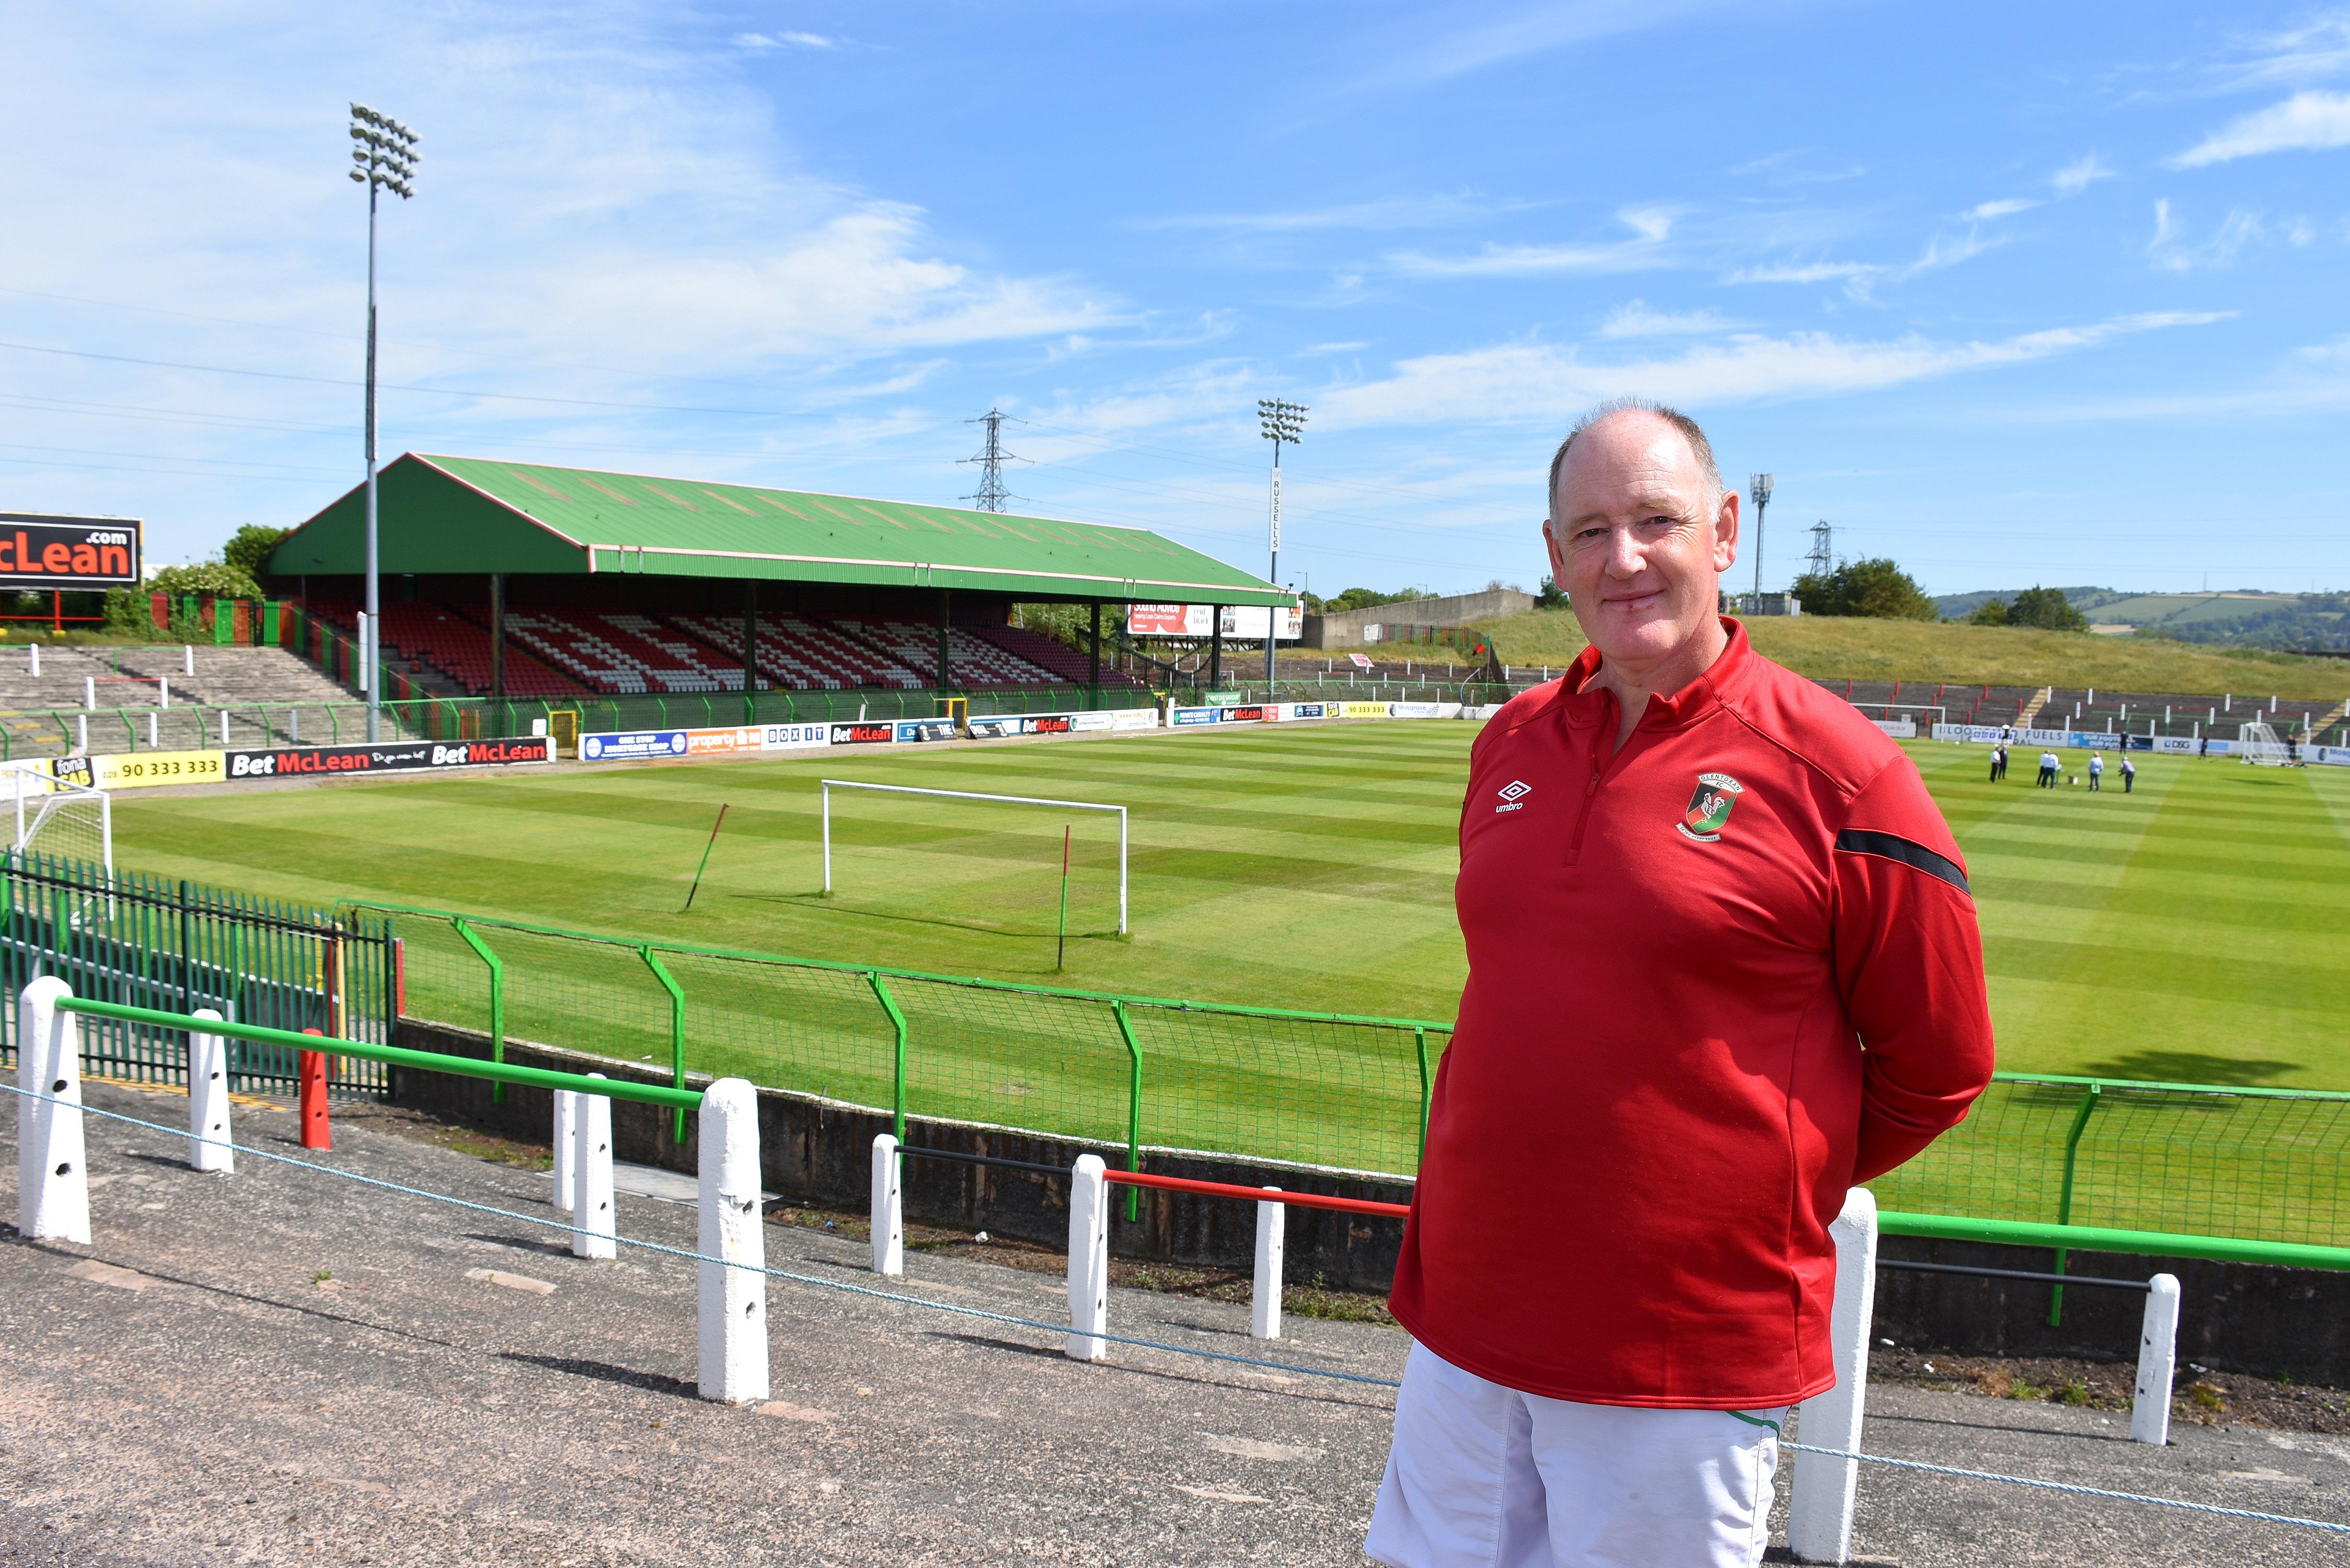 Glentoran Football Club - Presenting the perfect pitch Background